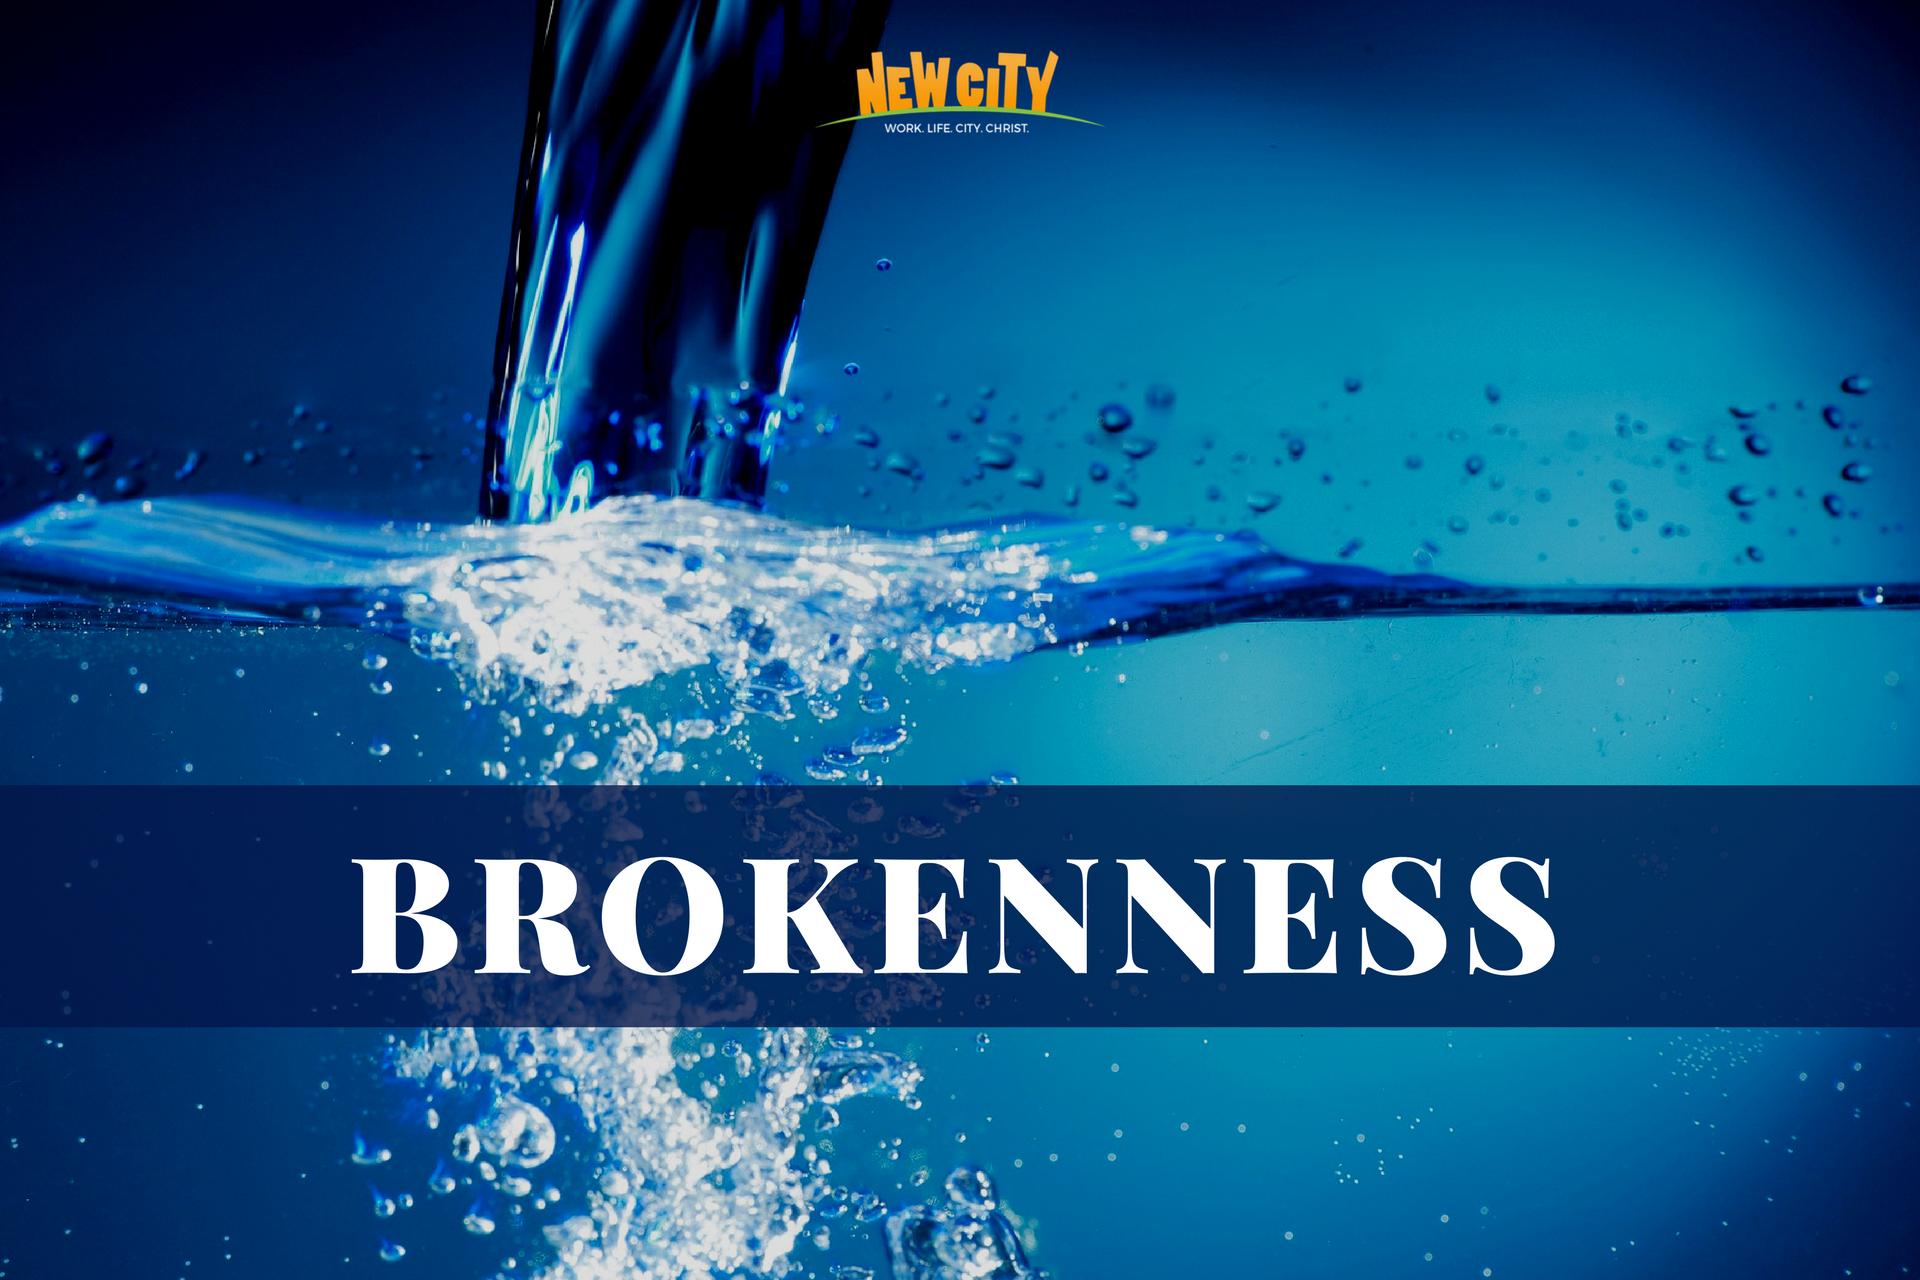 Brokenness Image